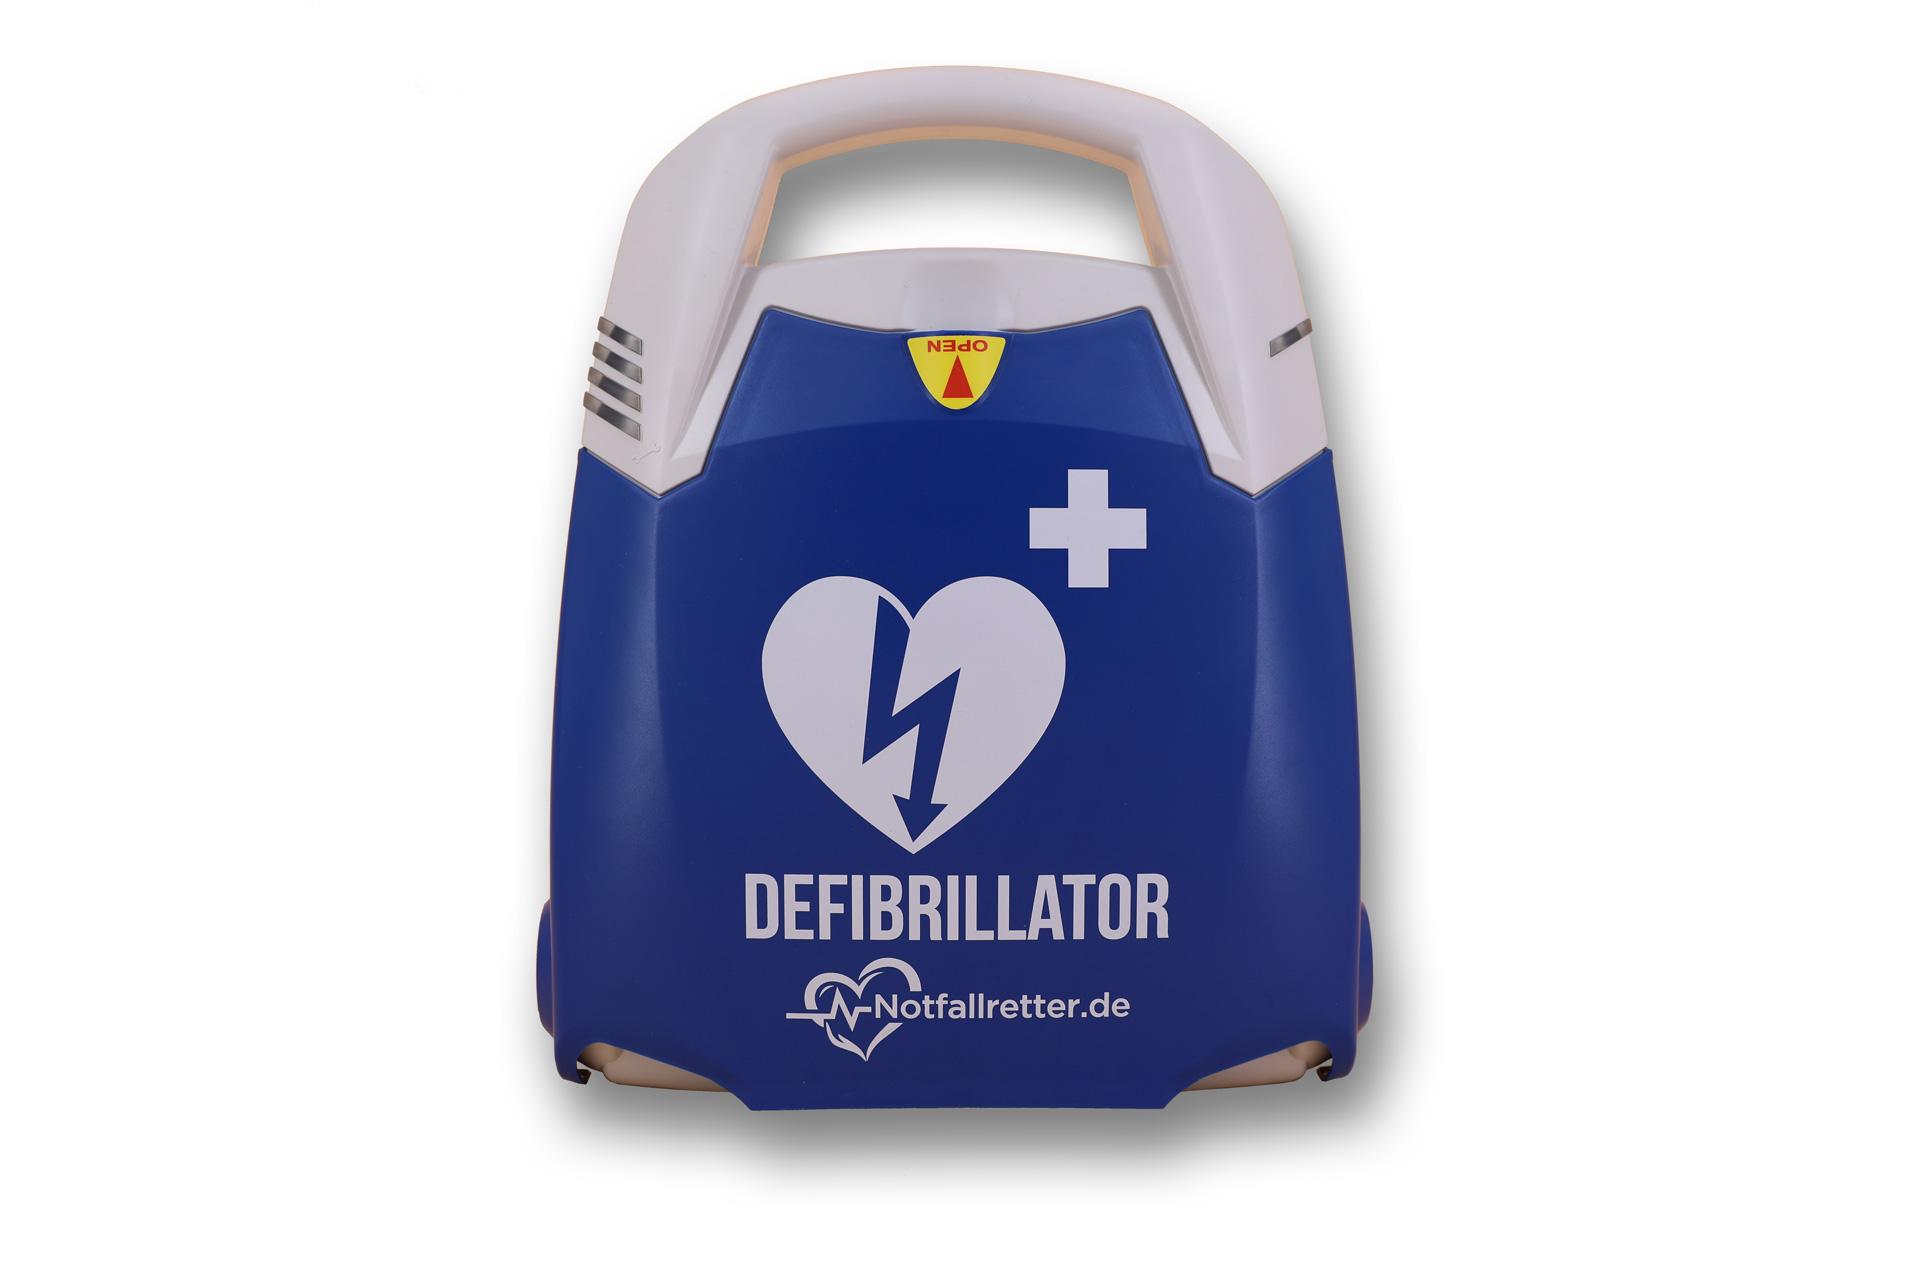 Notfallretter.de® Basic AED - Front